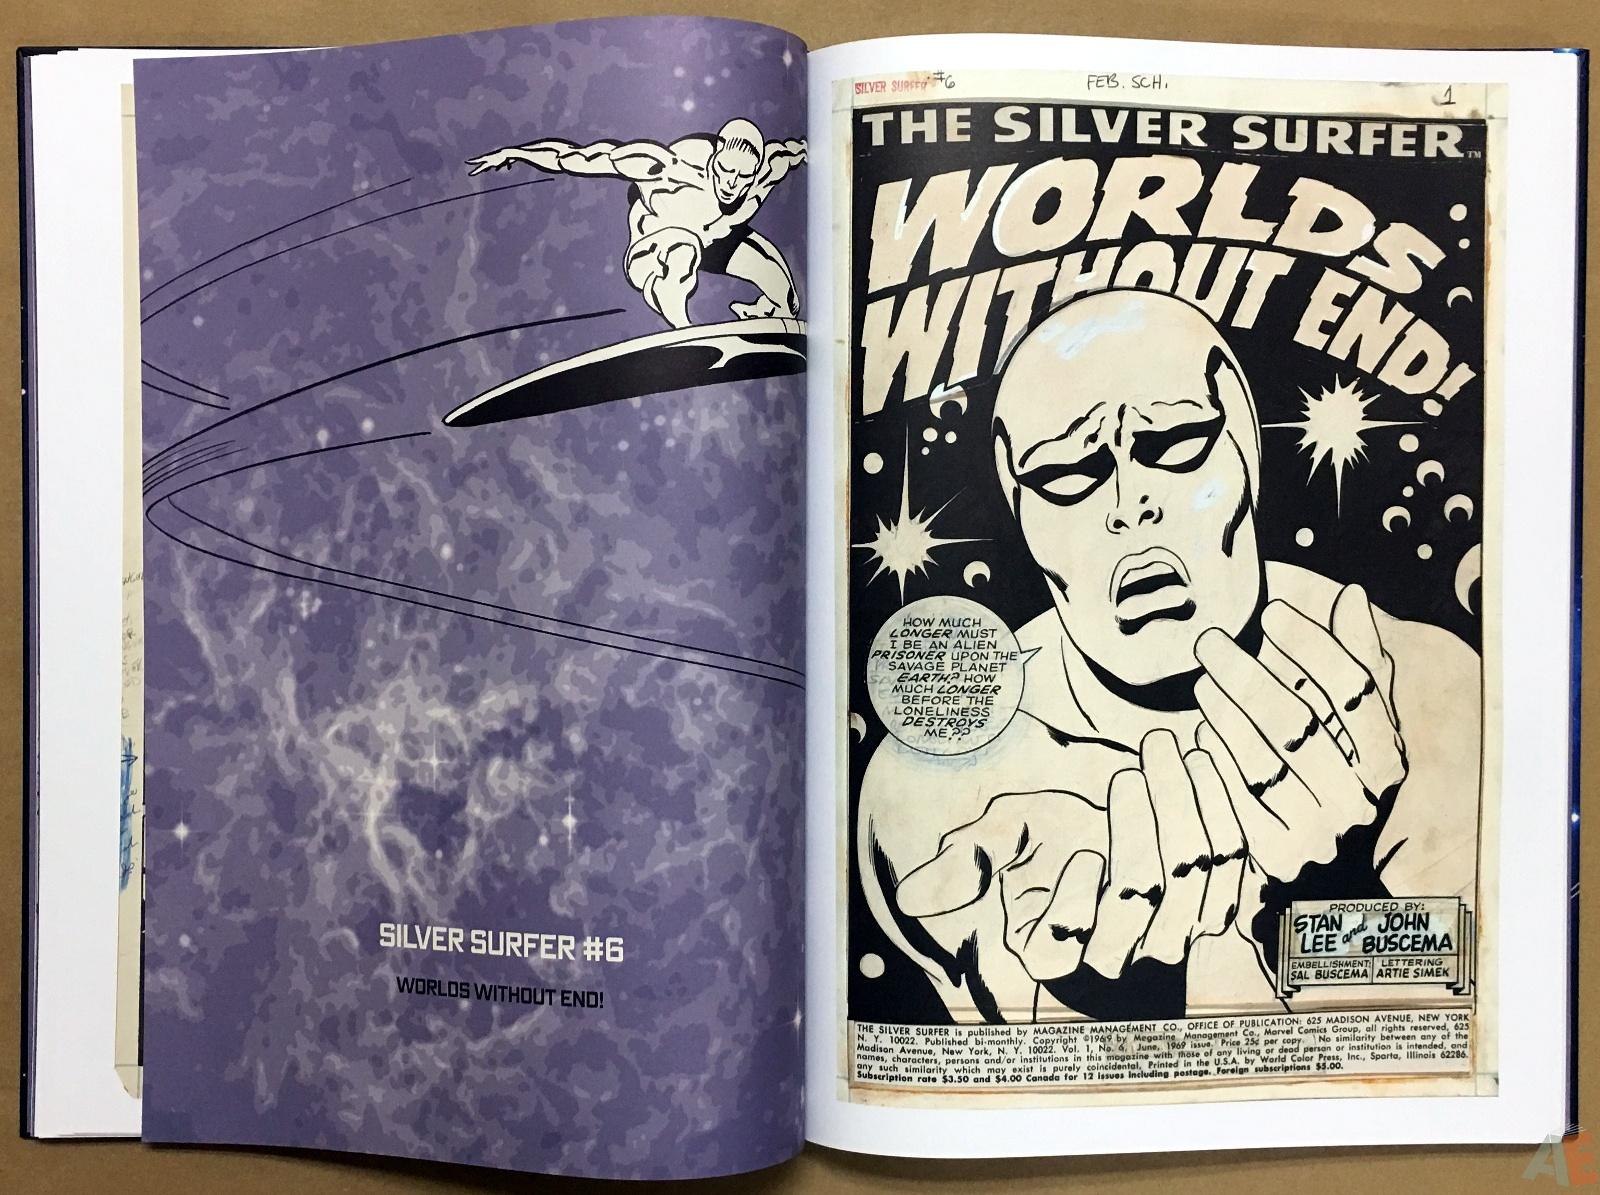 John Buscema's Silver Surfer Artist's Edition 16